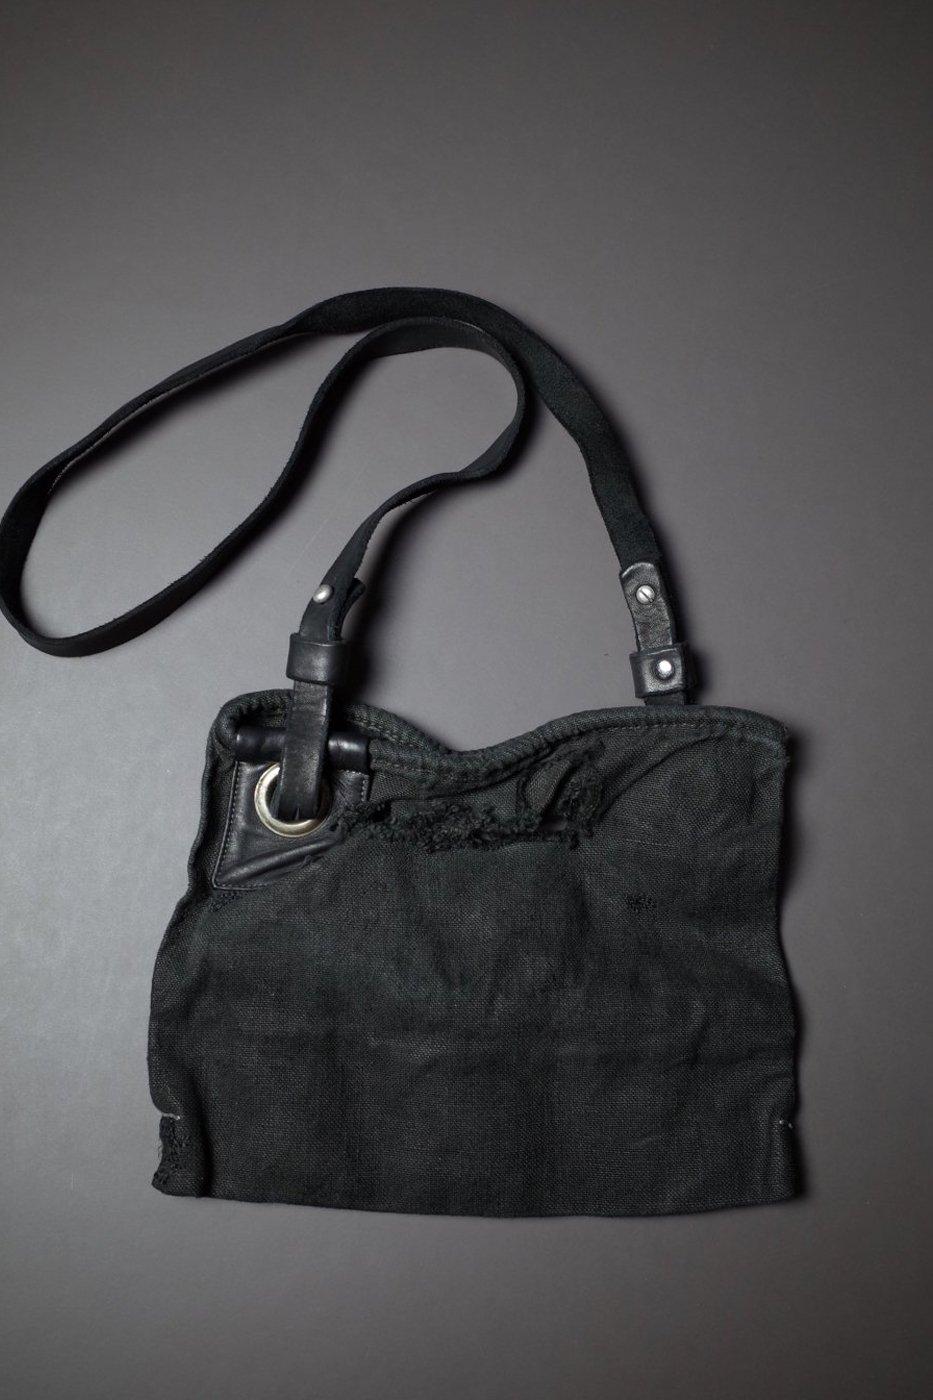 DELLE COSE デレコーゼ-SMALL SIZE SHOULDER BAG-BLACK-